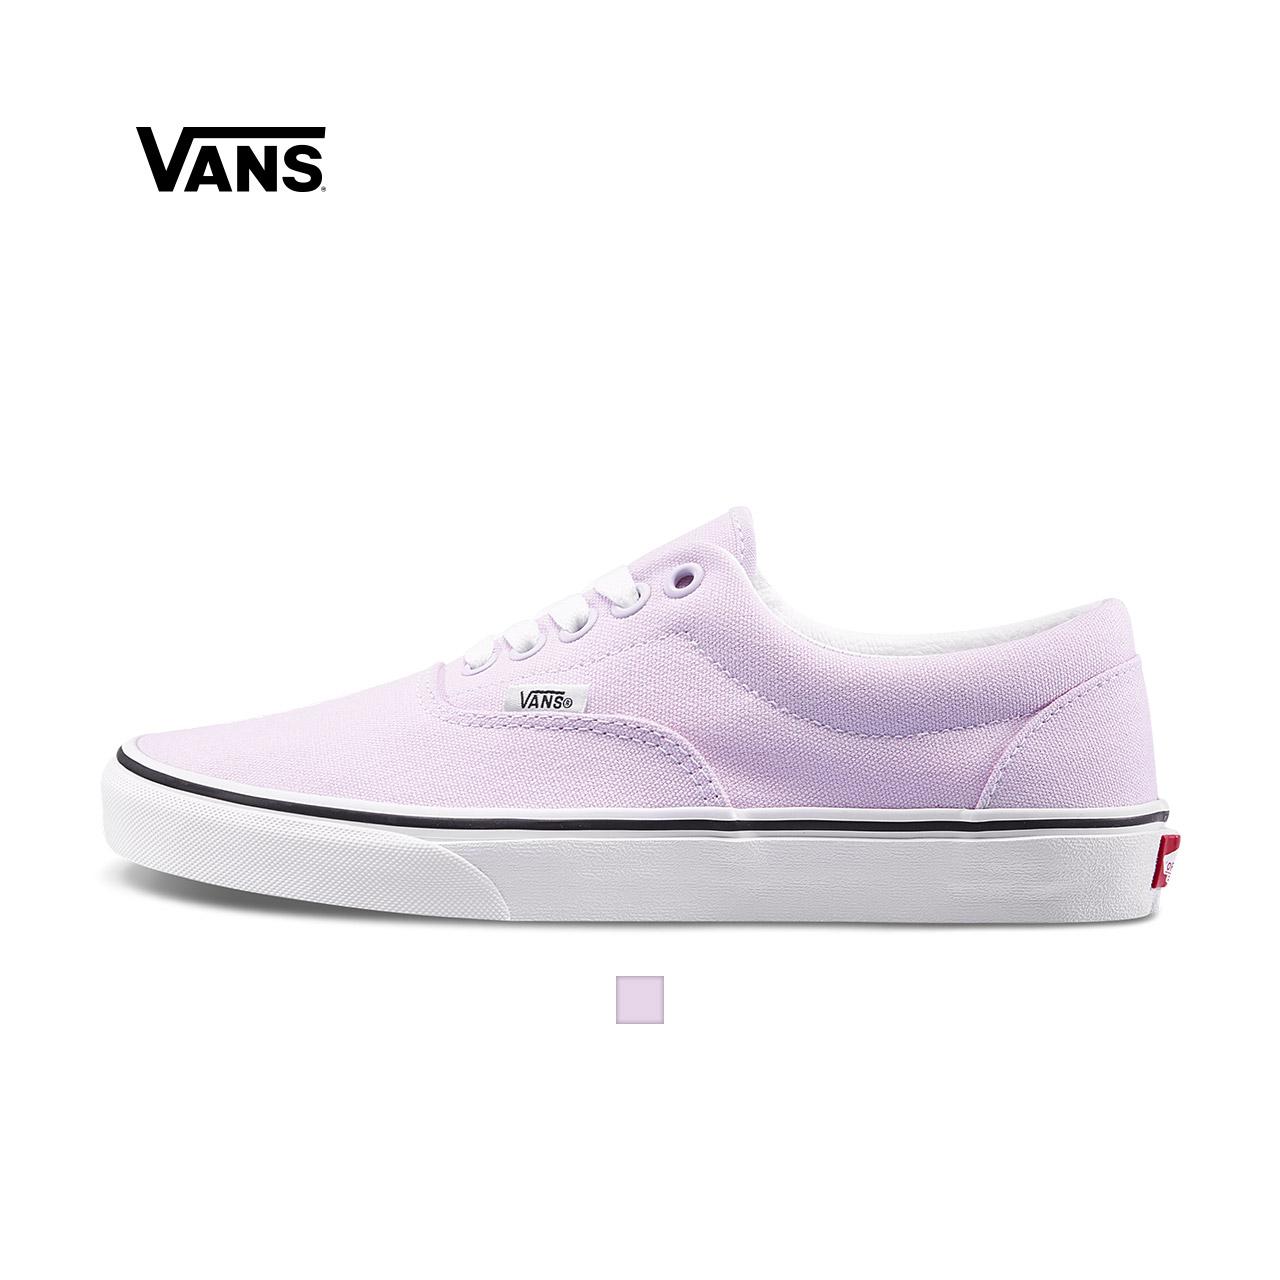 Vans范斯 经典系列 Era帆布鞋 低帮男女官方正品